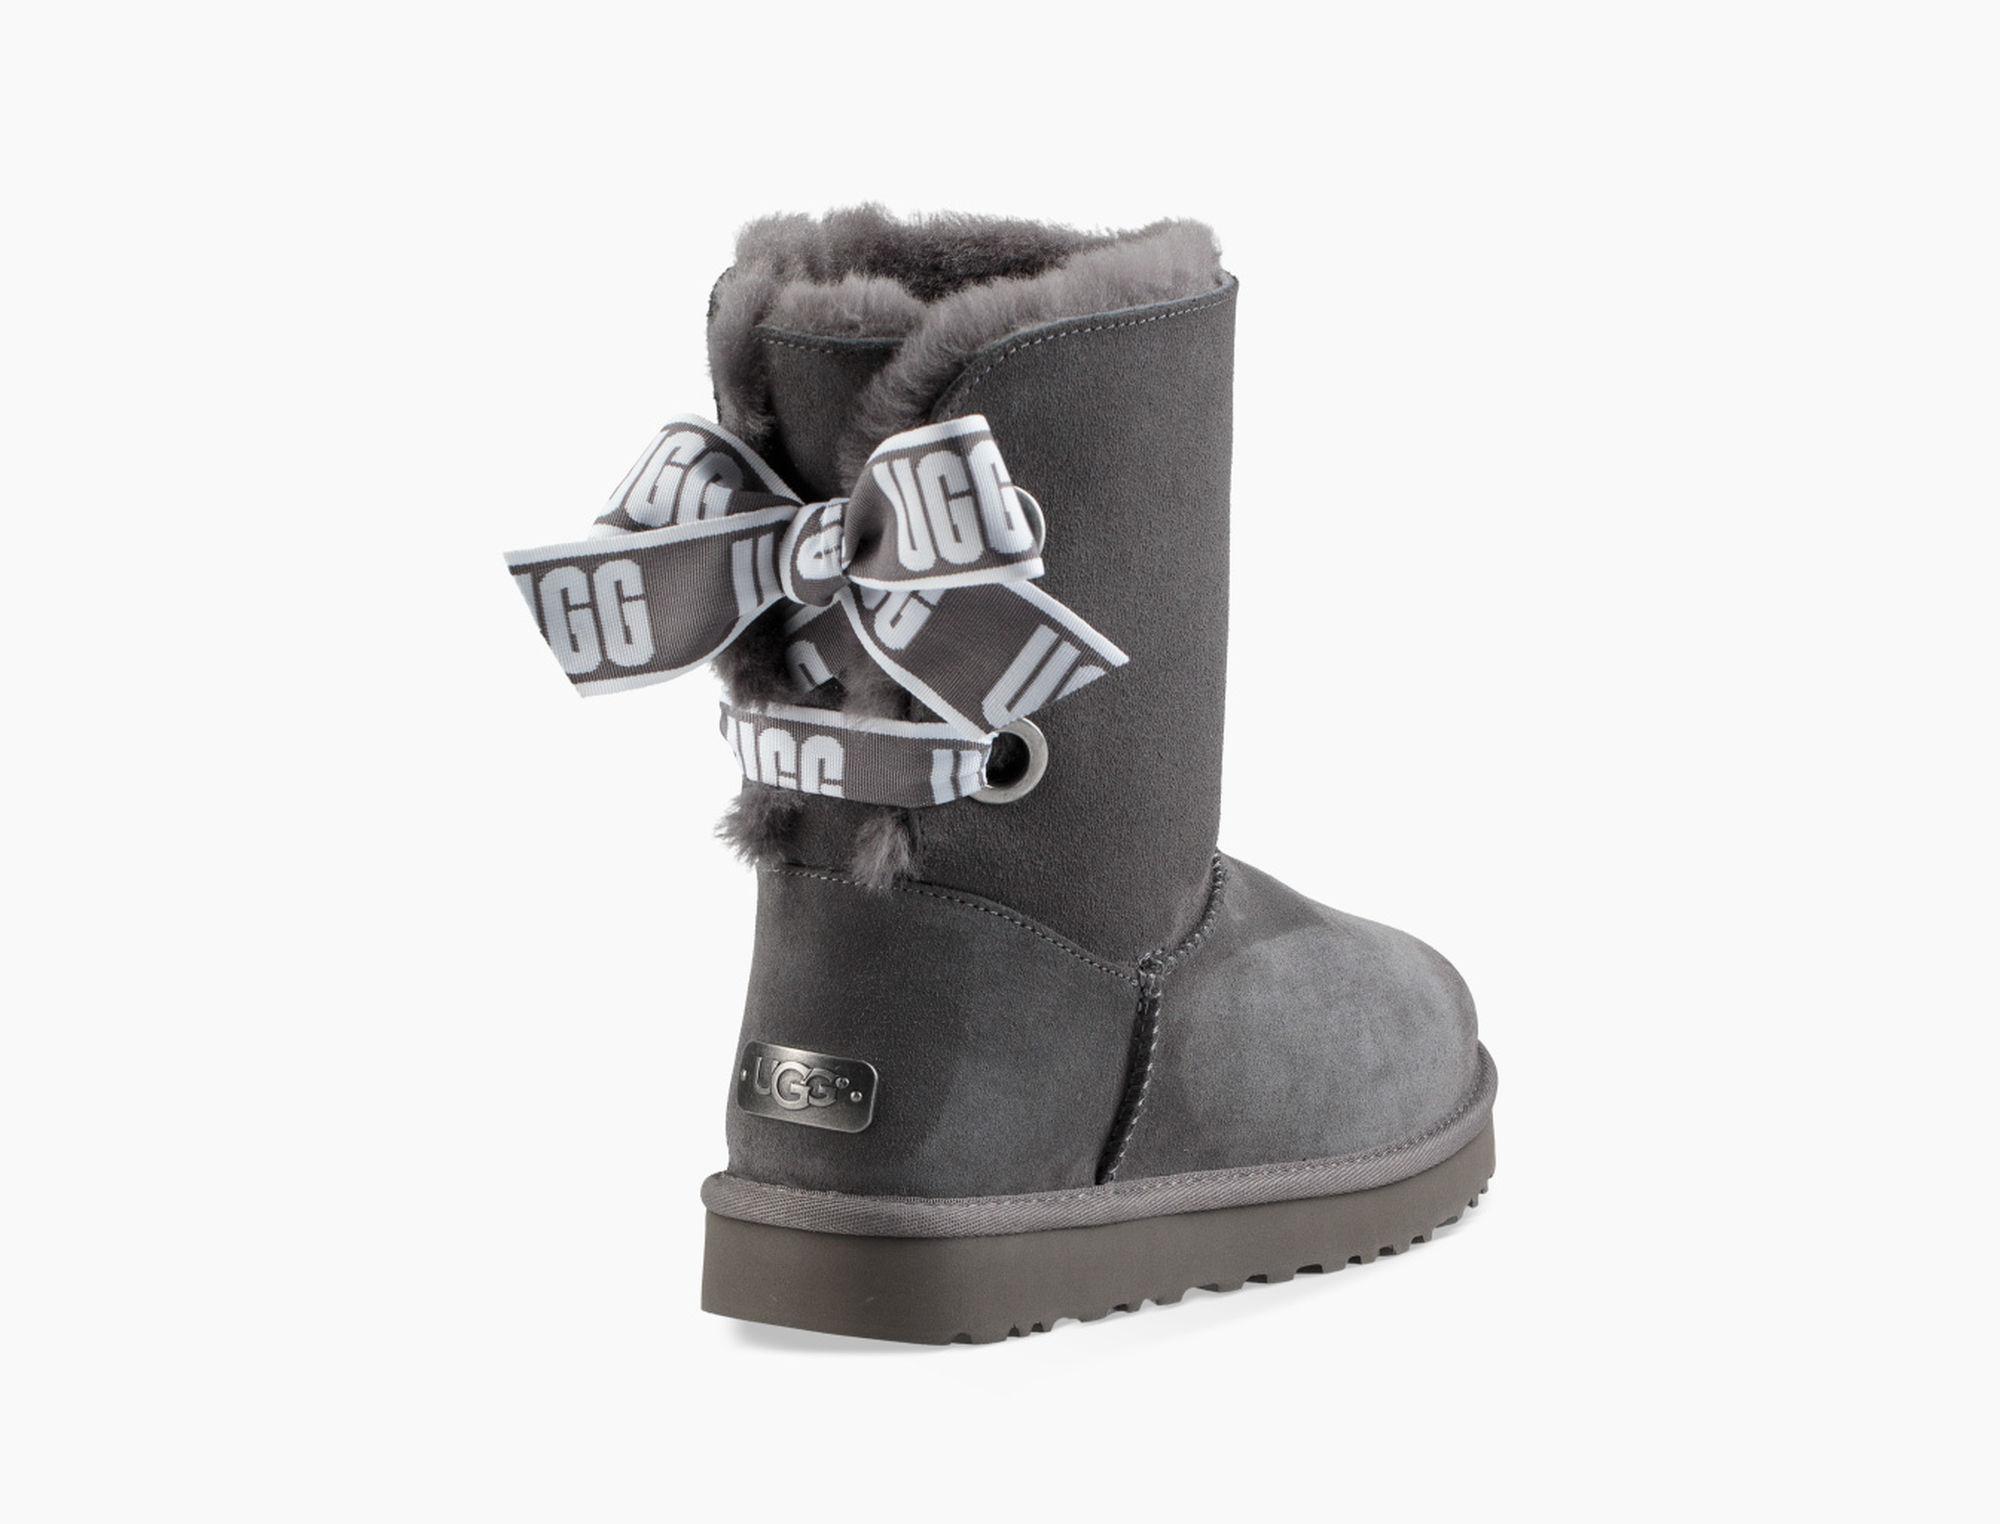 4c8ab764d38 Women's Gray Customizable Bailey Bow Short Boot Customizable Bailey Bow  Short Boot Short Bailey Bow Satin Ribbon